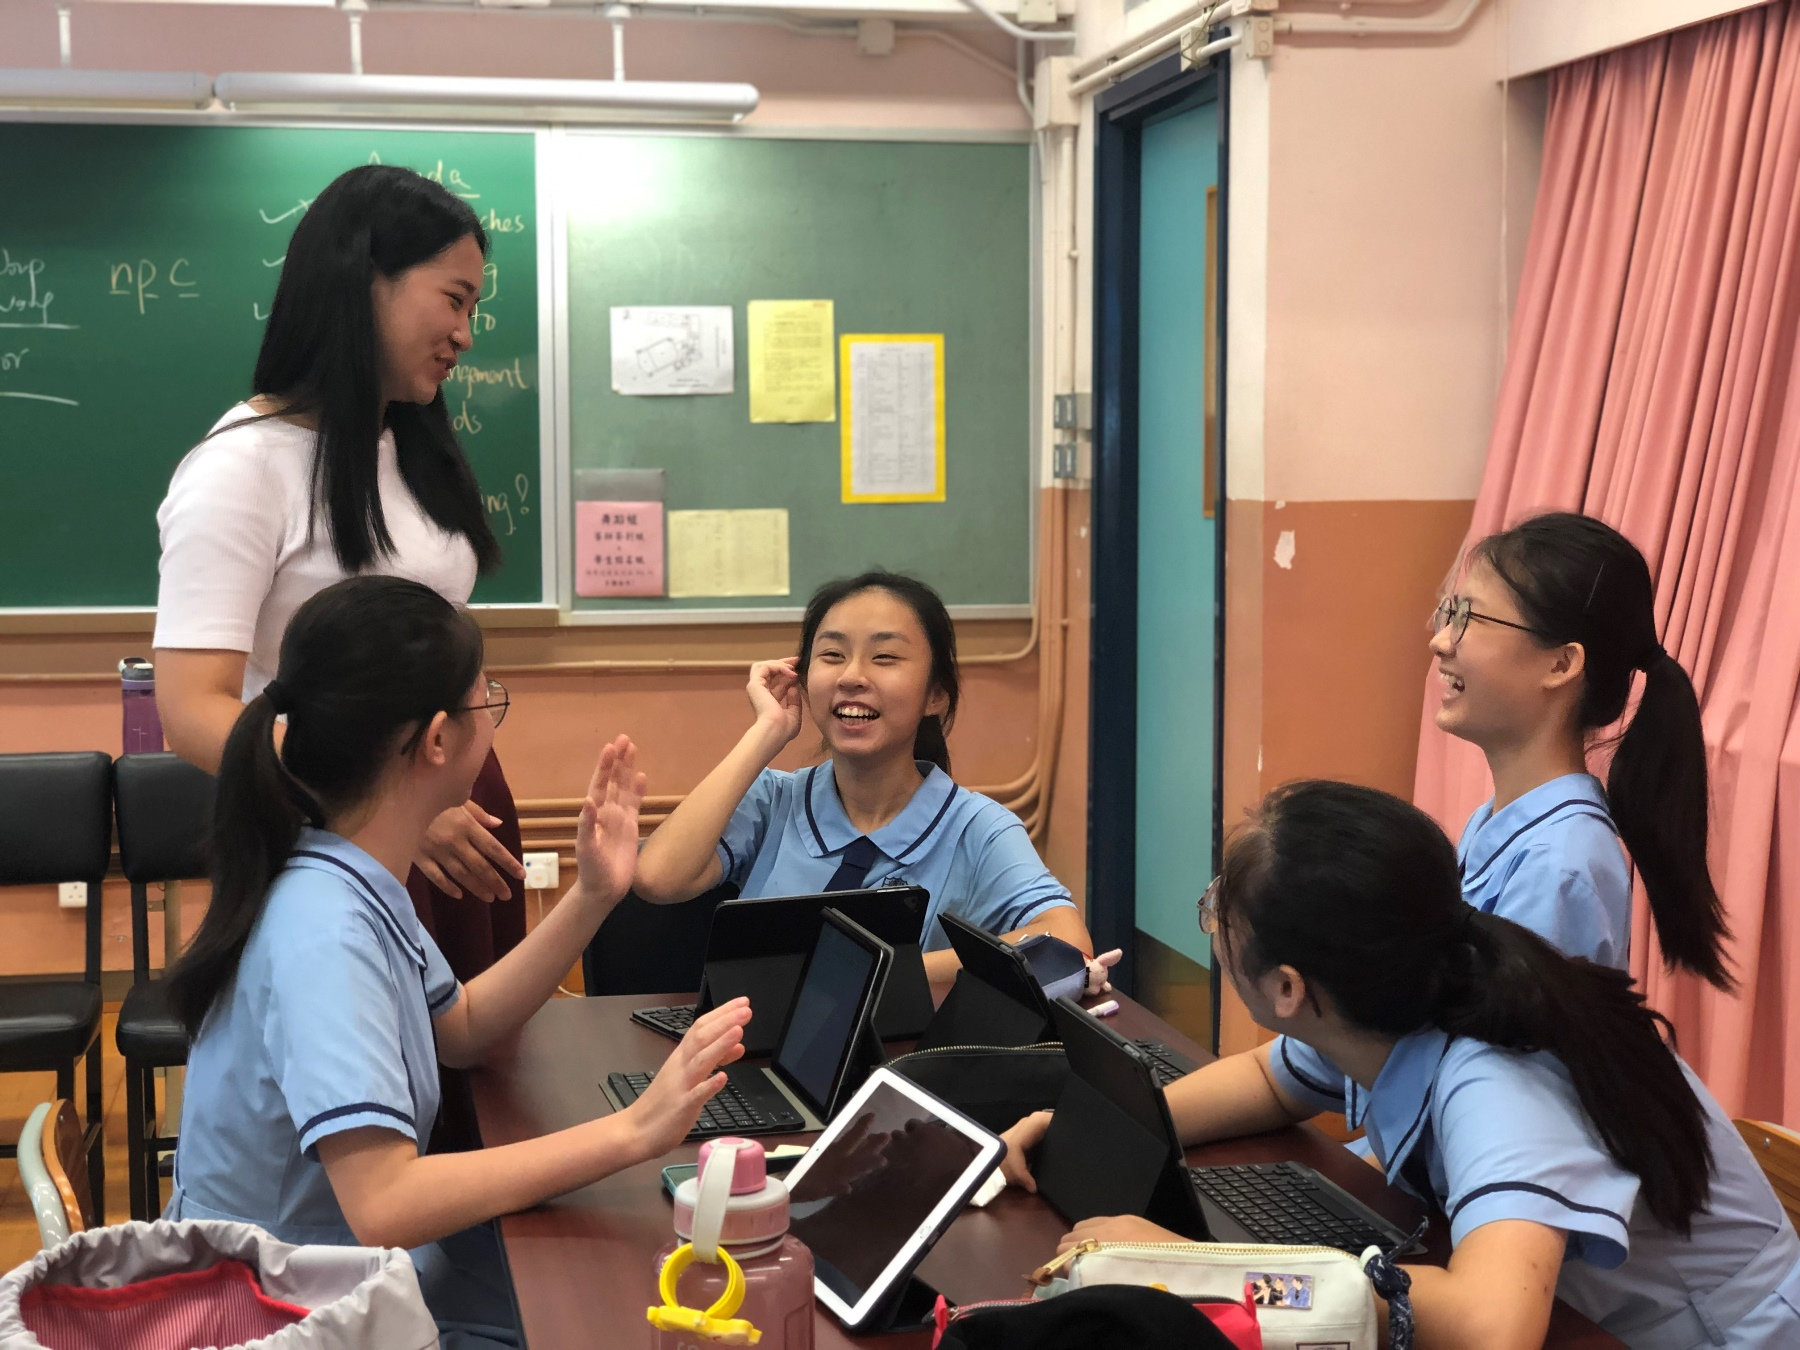 https://www.npc.edu.hk/sites/default/files/img_4588.jpg